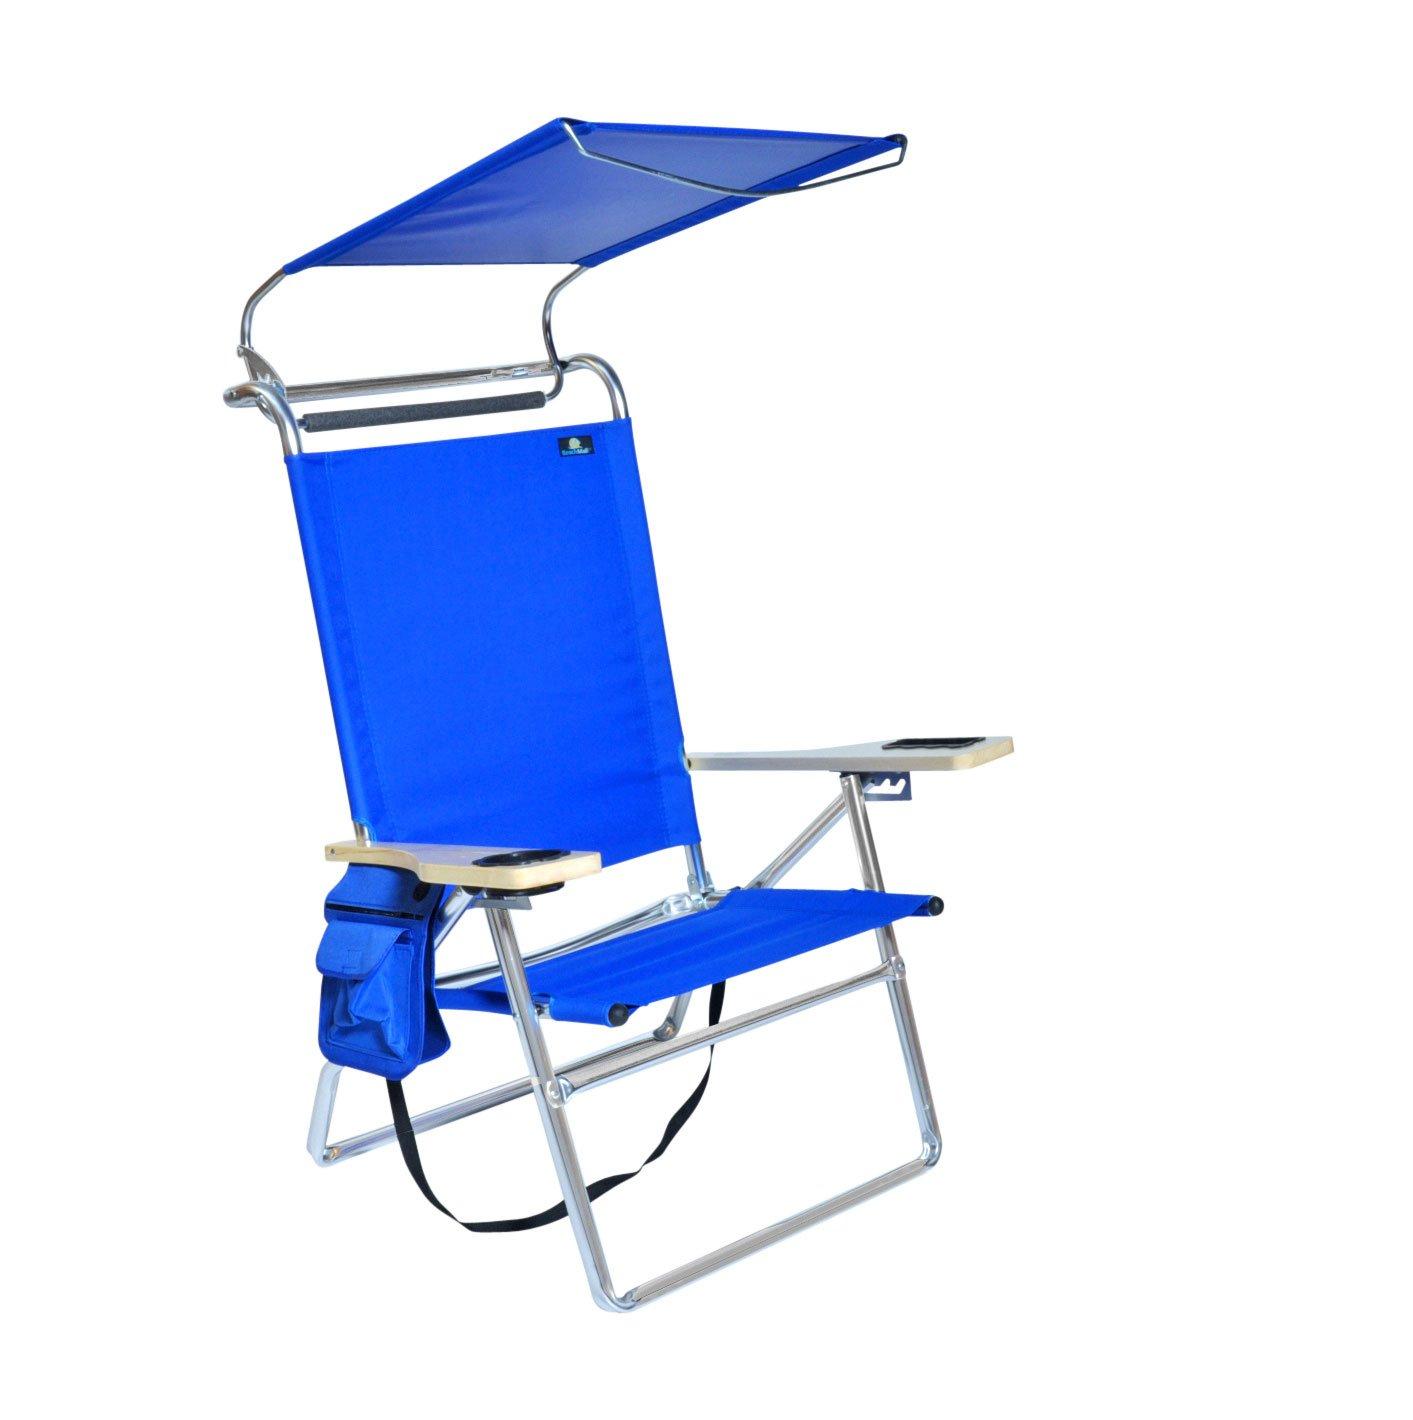 Amazon BeachMall Deluxe 4 Position Aluminum Beach Chair with